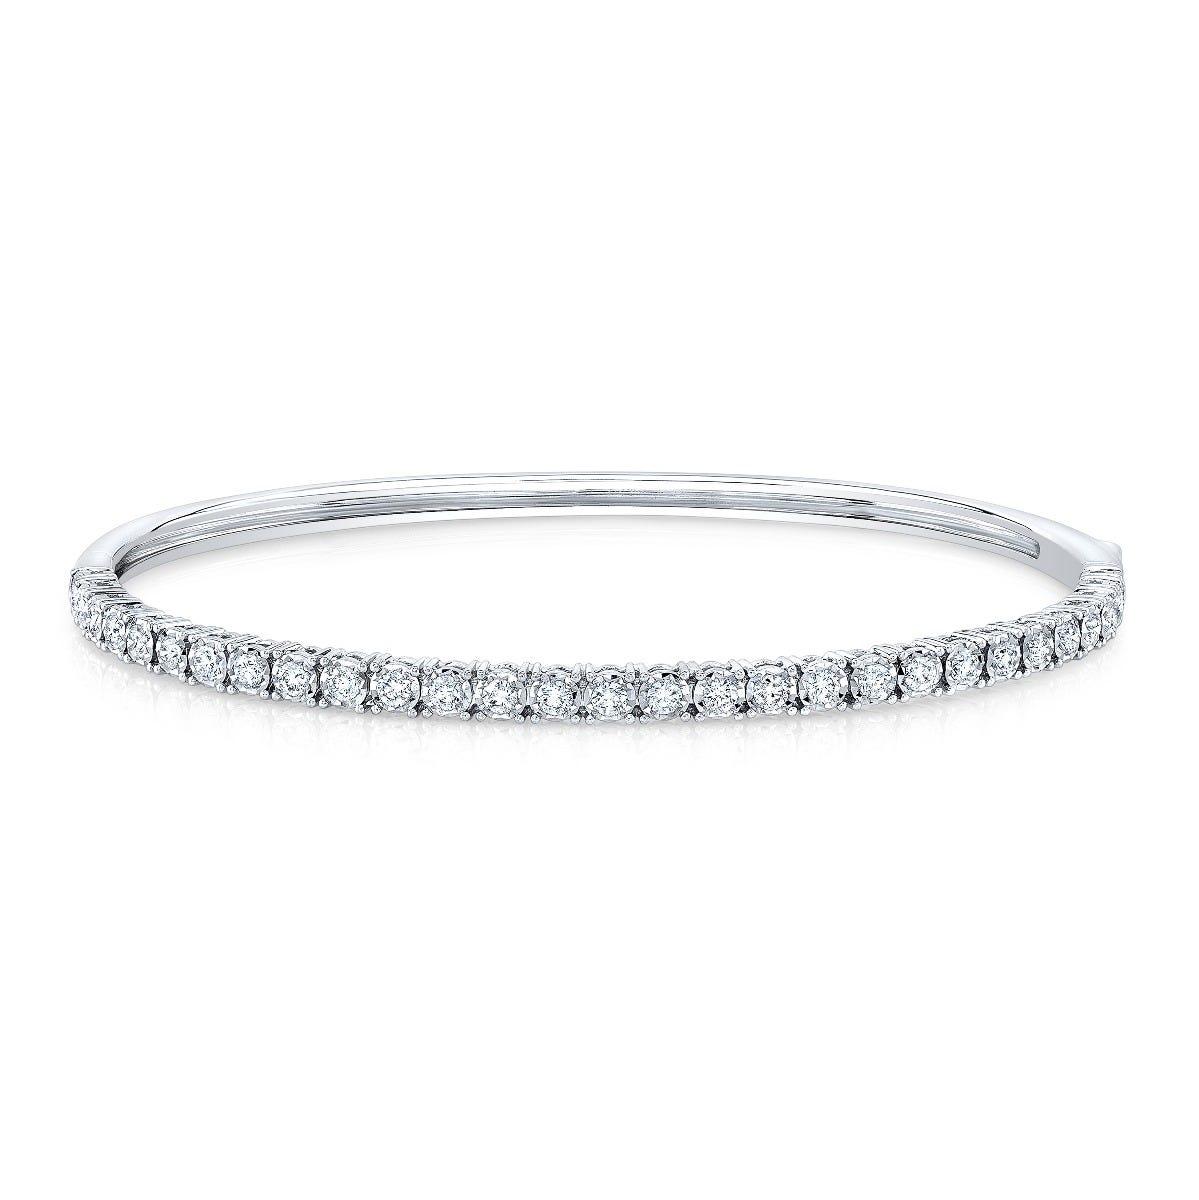 Diamond 1ctw. Prong Bangle in 14k White Gold